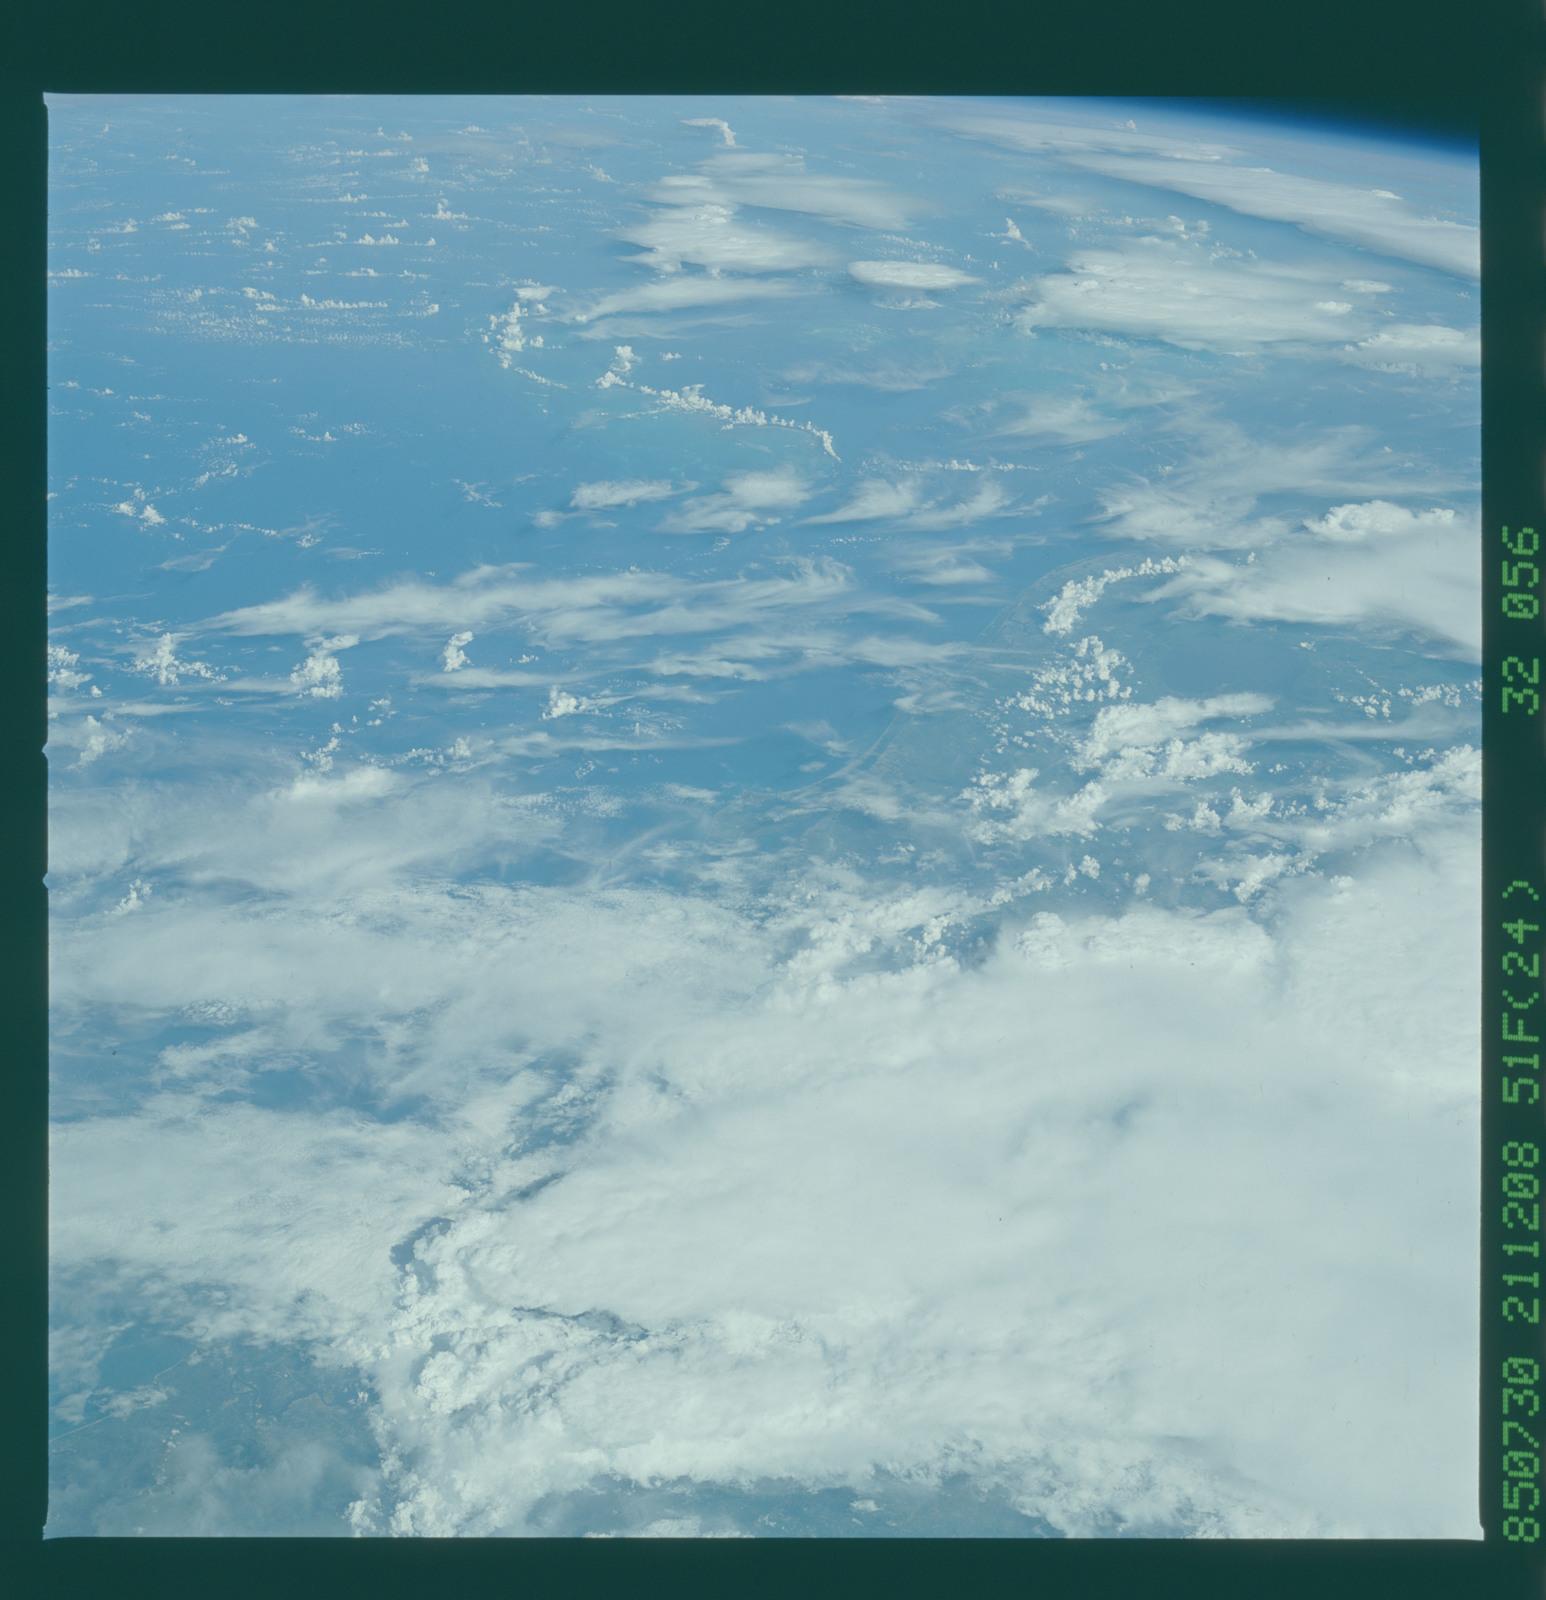 51F-32-056 - STS-51F - 51F earth observations